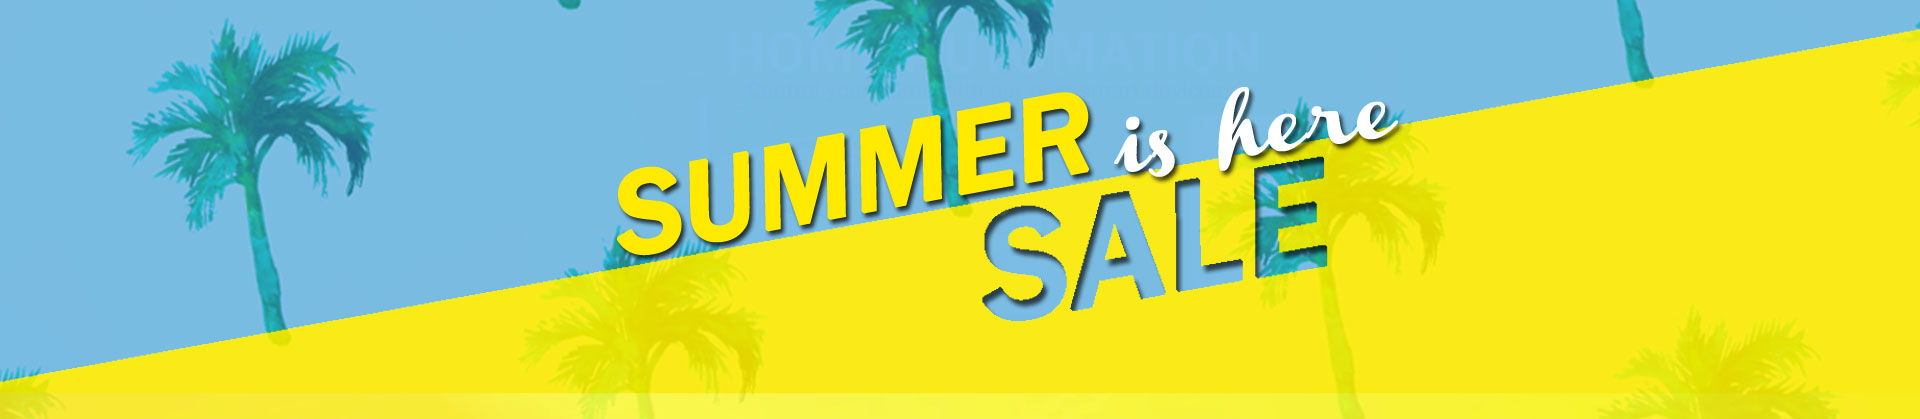 Enjoy our fantastic savings this summer